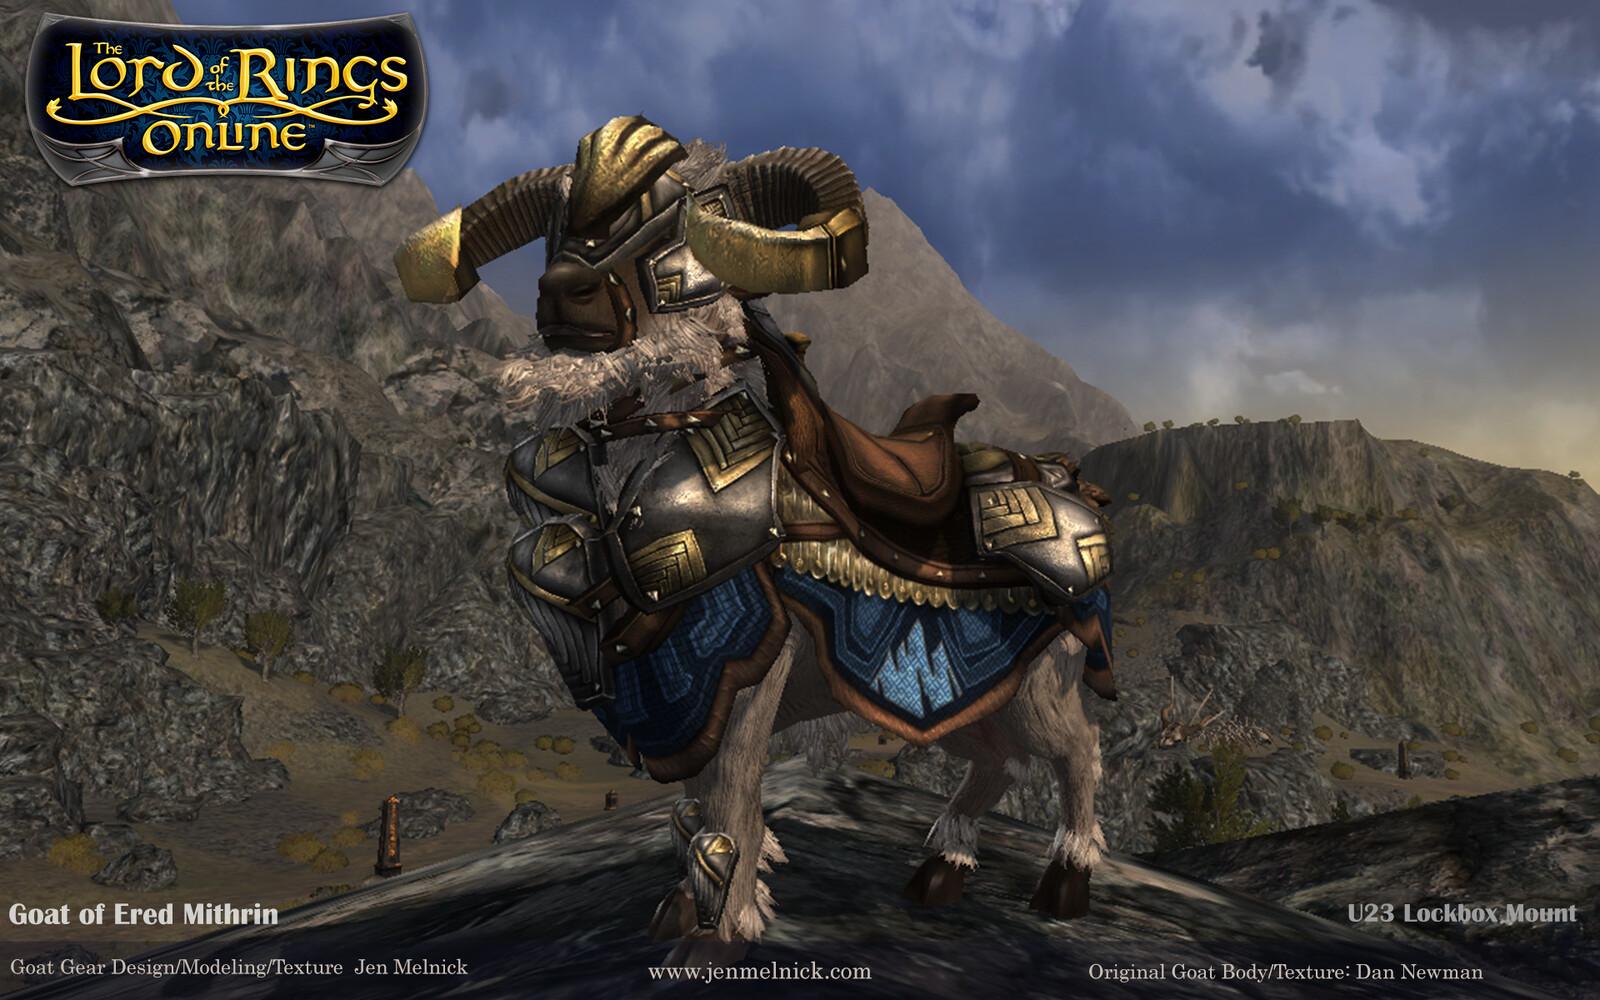 U23 Lockbox Mount Goat of Ered Mithrin In-Game Render